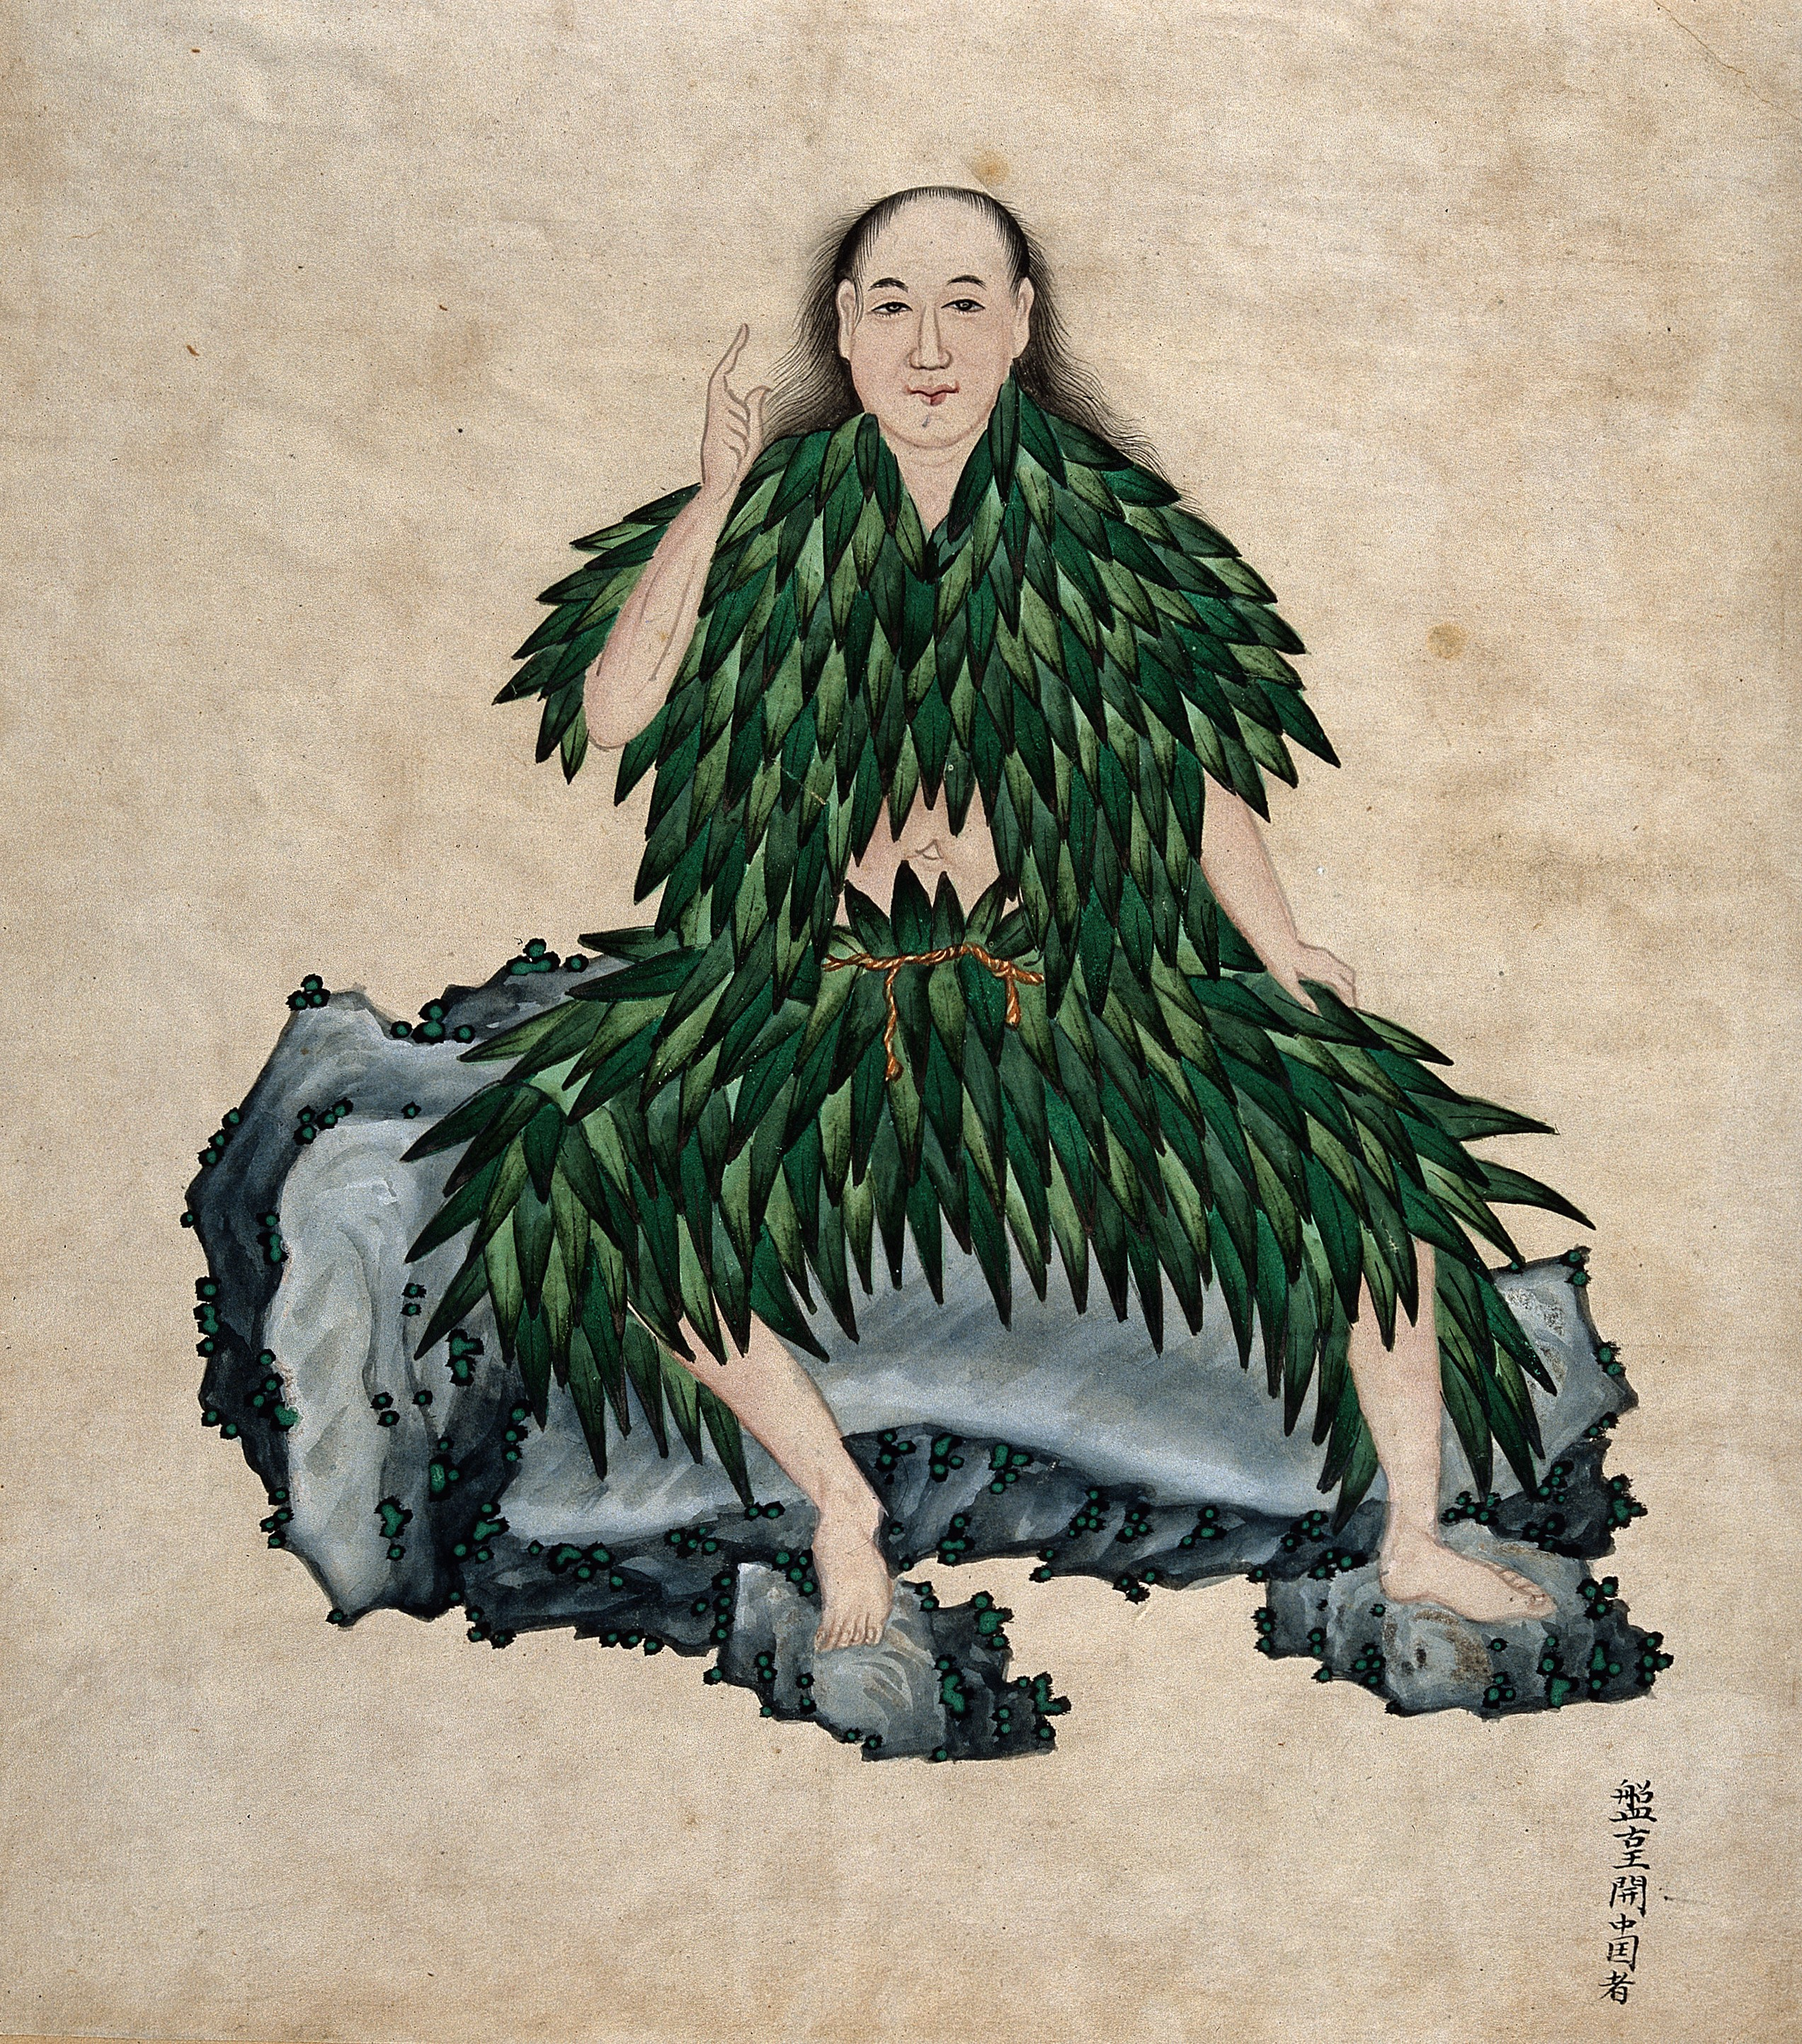 Shen Nung seated on a rock%2C wearing simple garments Wellcome V0018485 A incrível história de 10.000 anos que a humanidade compartilha com a cannabis